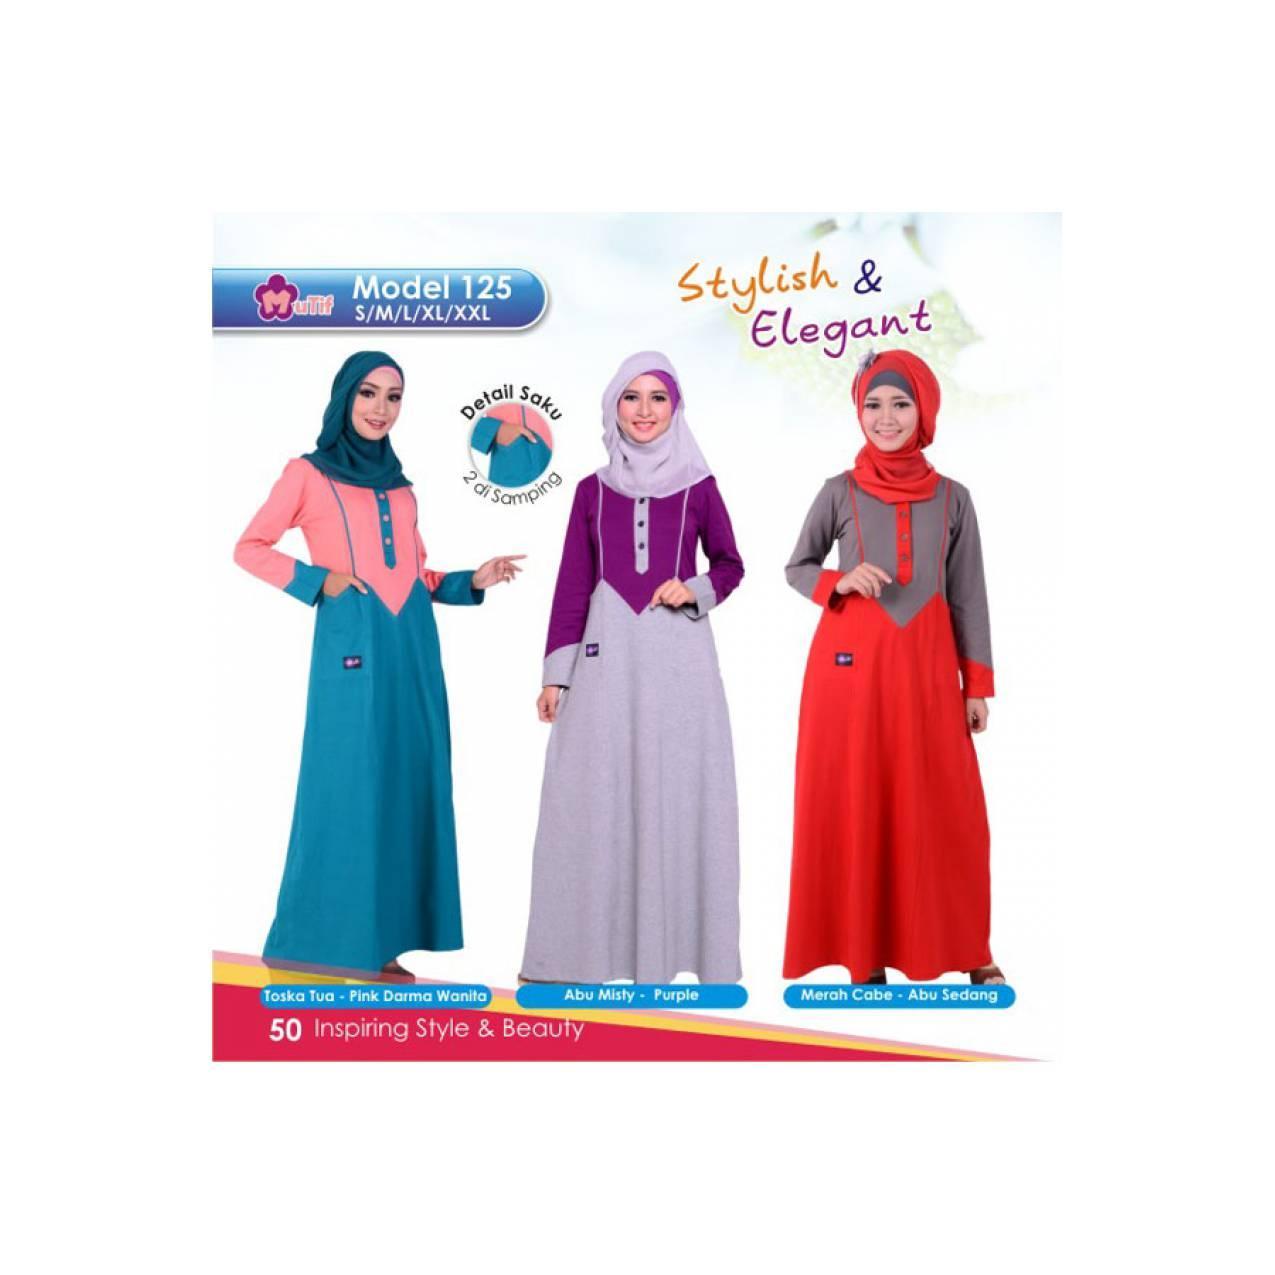 Baju Mutif Gamis Bahan Kaos Murah Ori - Model 125